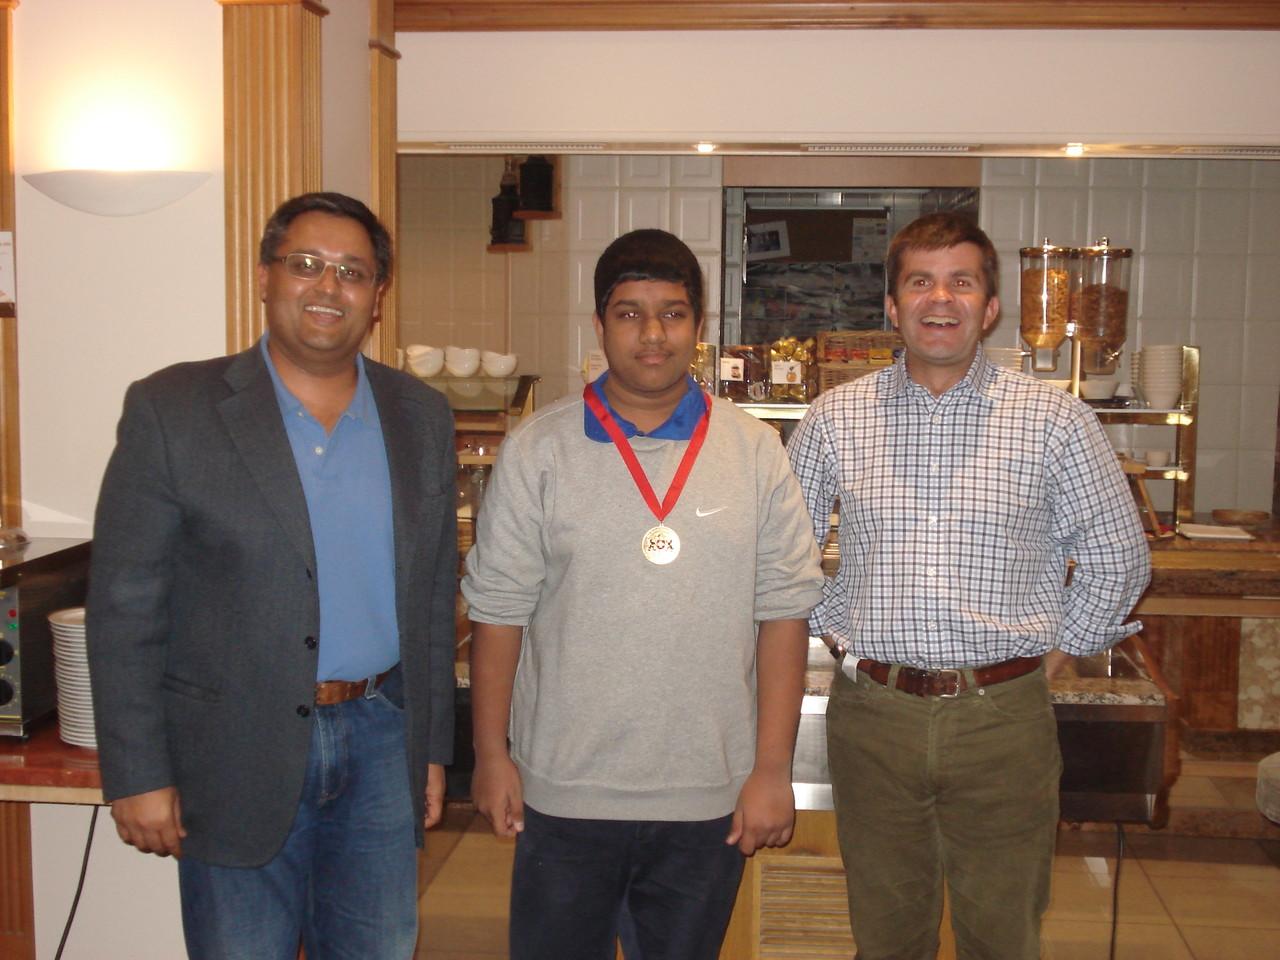 U15 Bob Barber Award Winner 2103: Marishque Puvimamasinghe